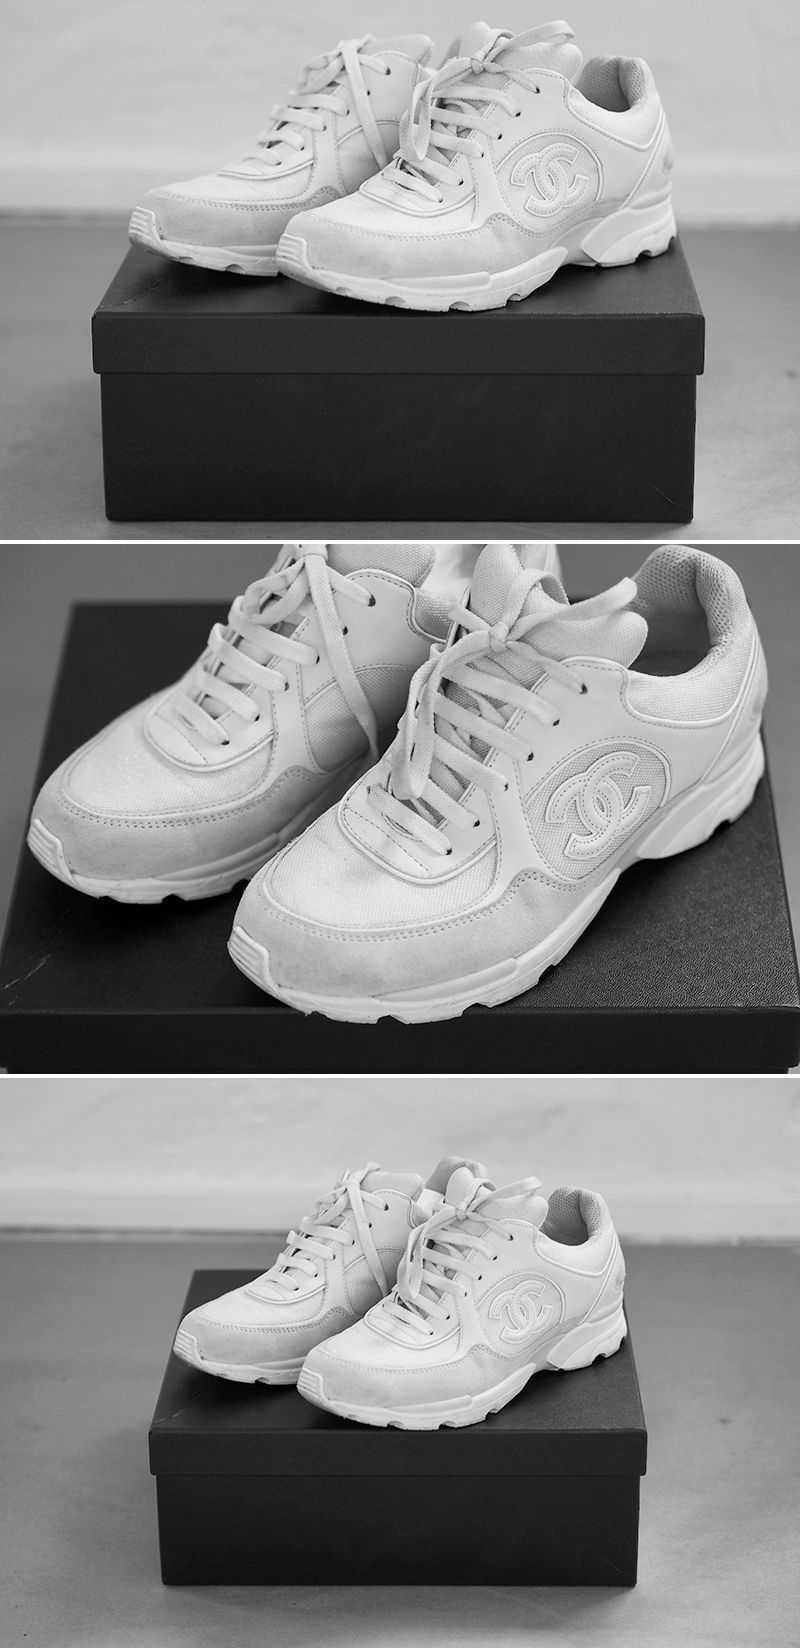 separation shoes e2515 c998a white chanel sneakers Chanel Sko, Nike Basketball, Nike Shox, Zapatos, Mode,